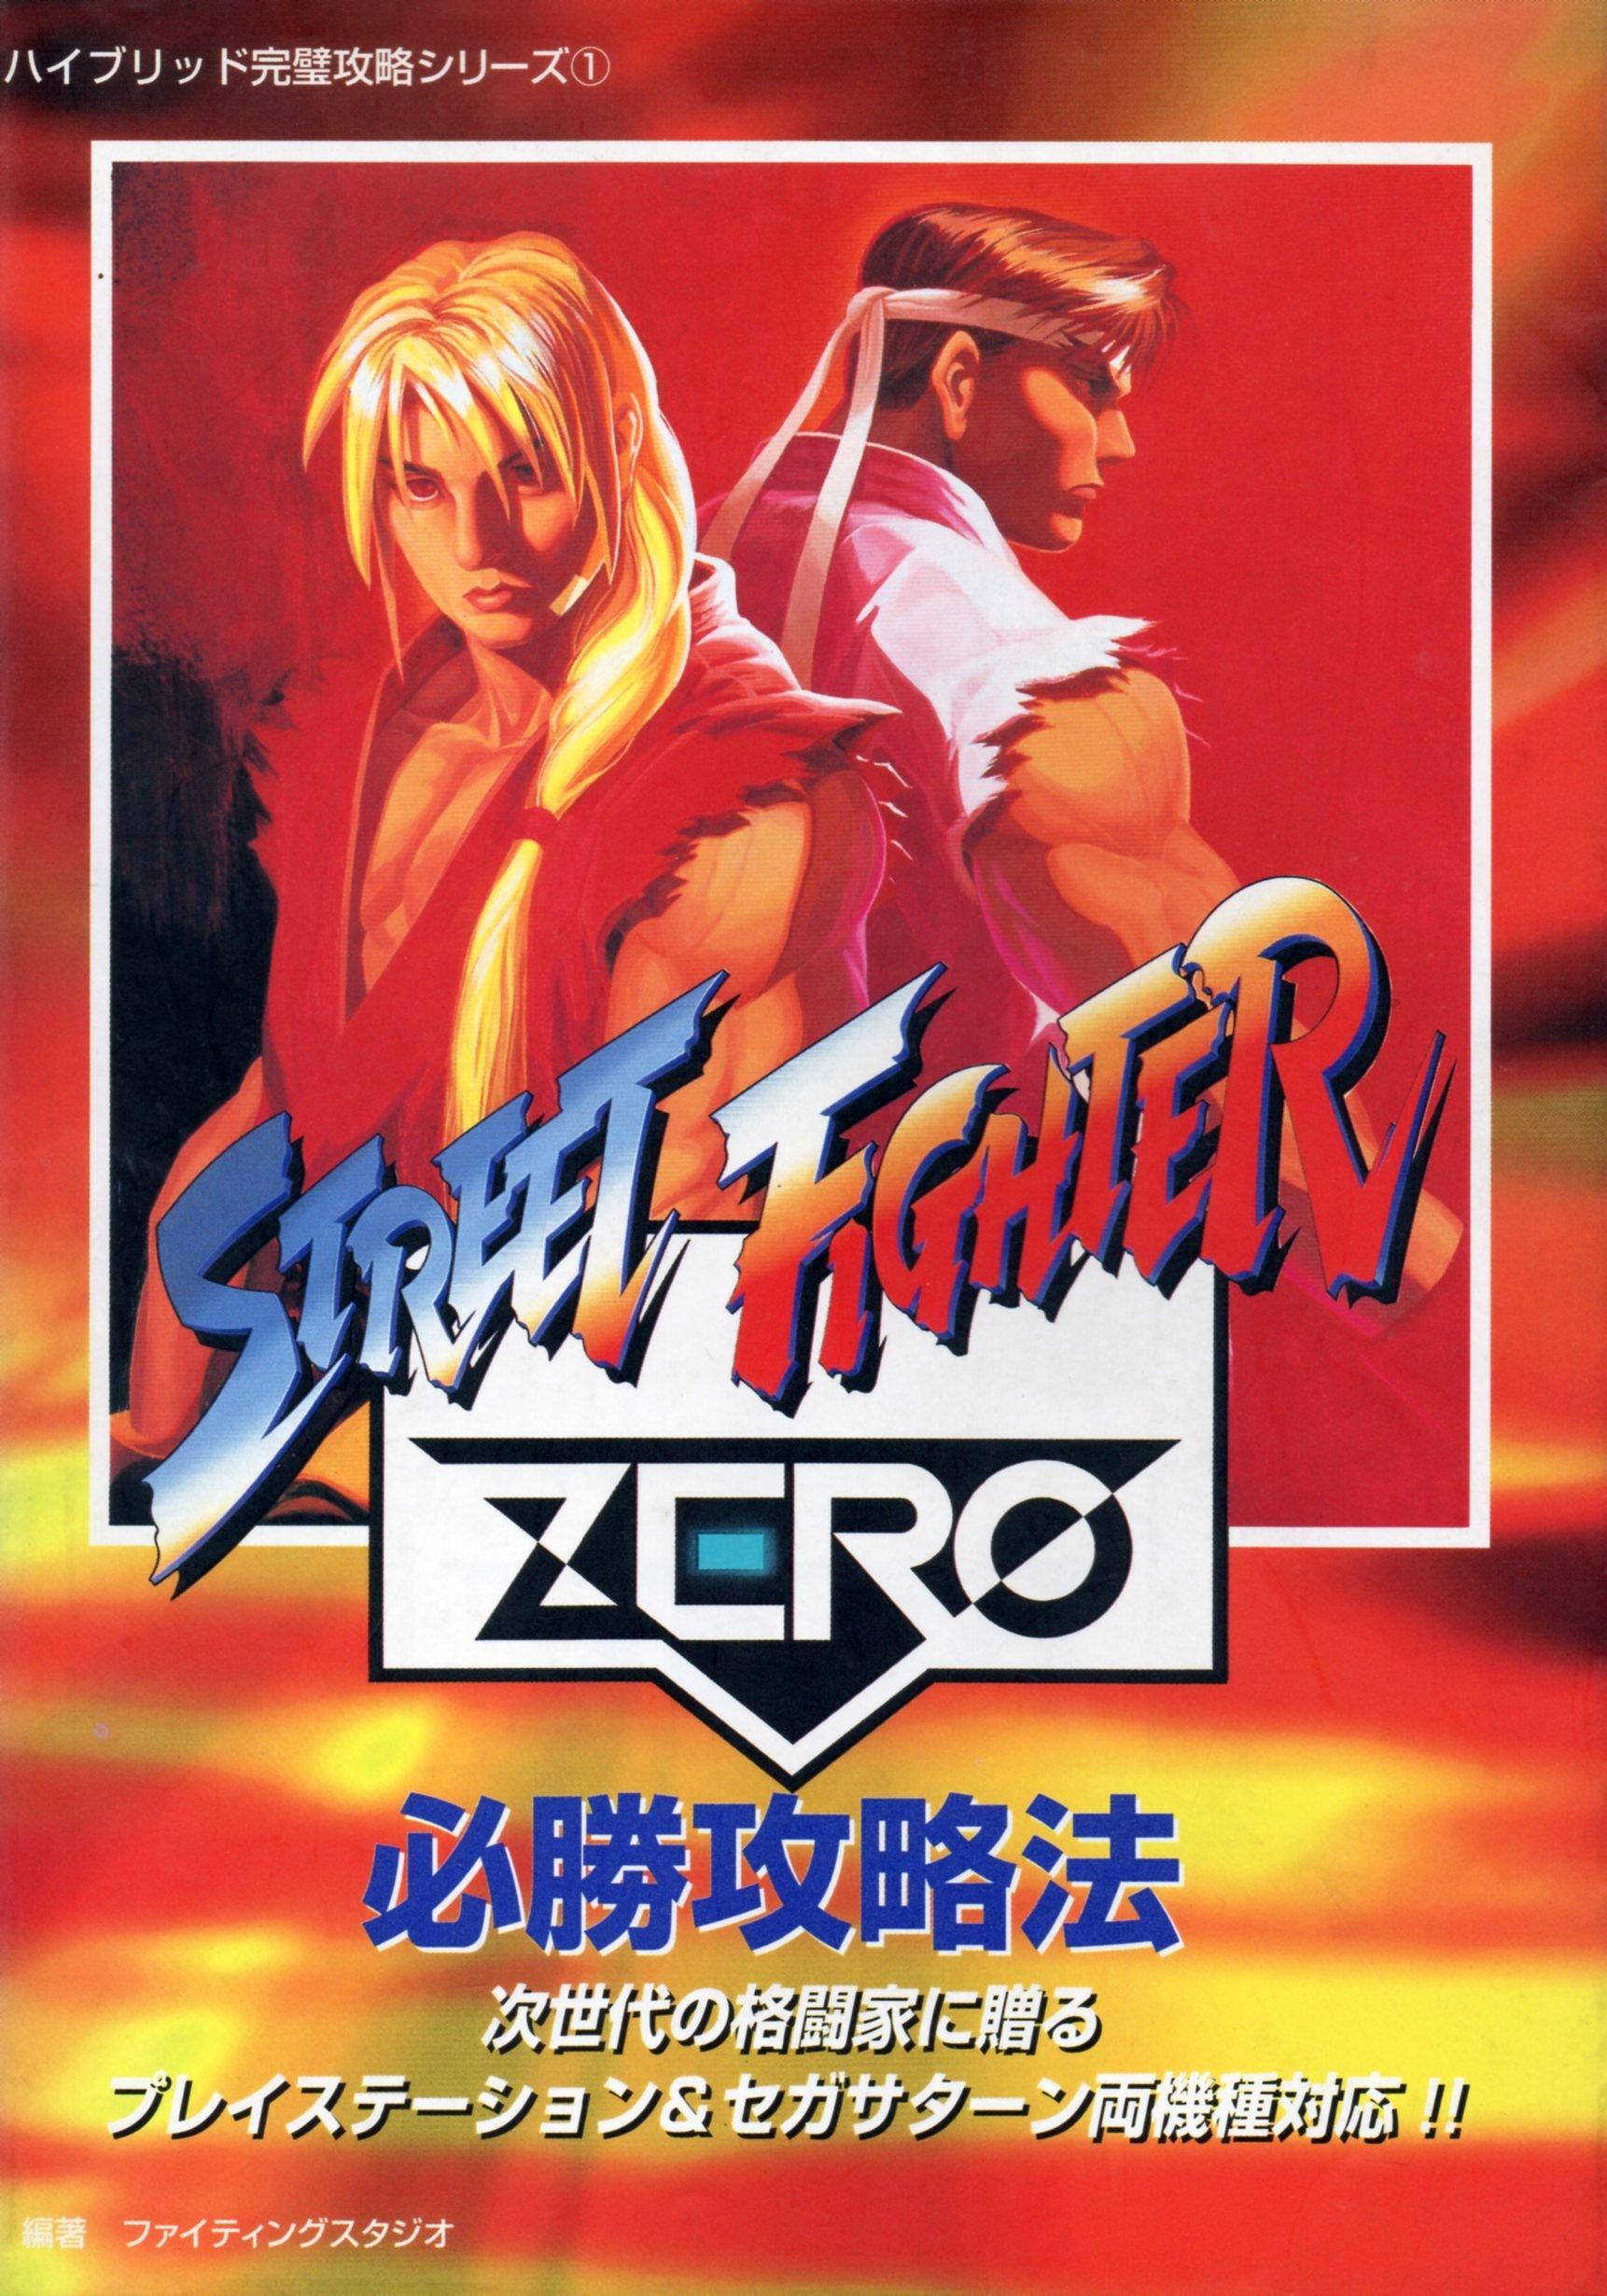 Street Fighter Zero - hisshō kōryaku-hō